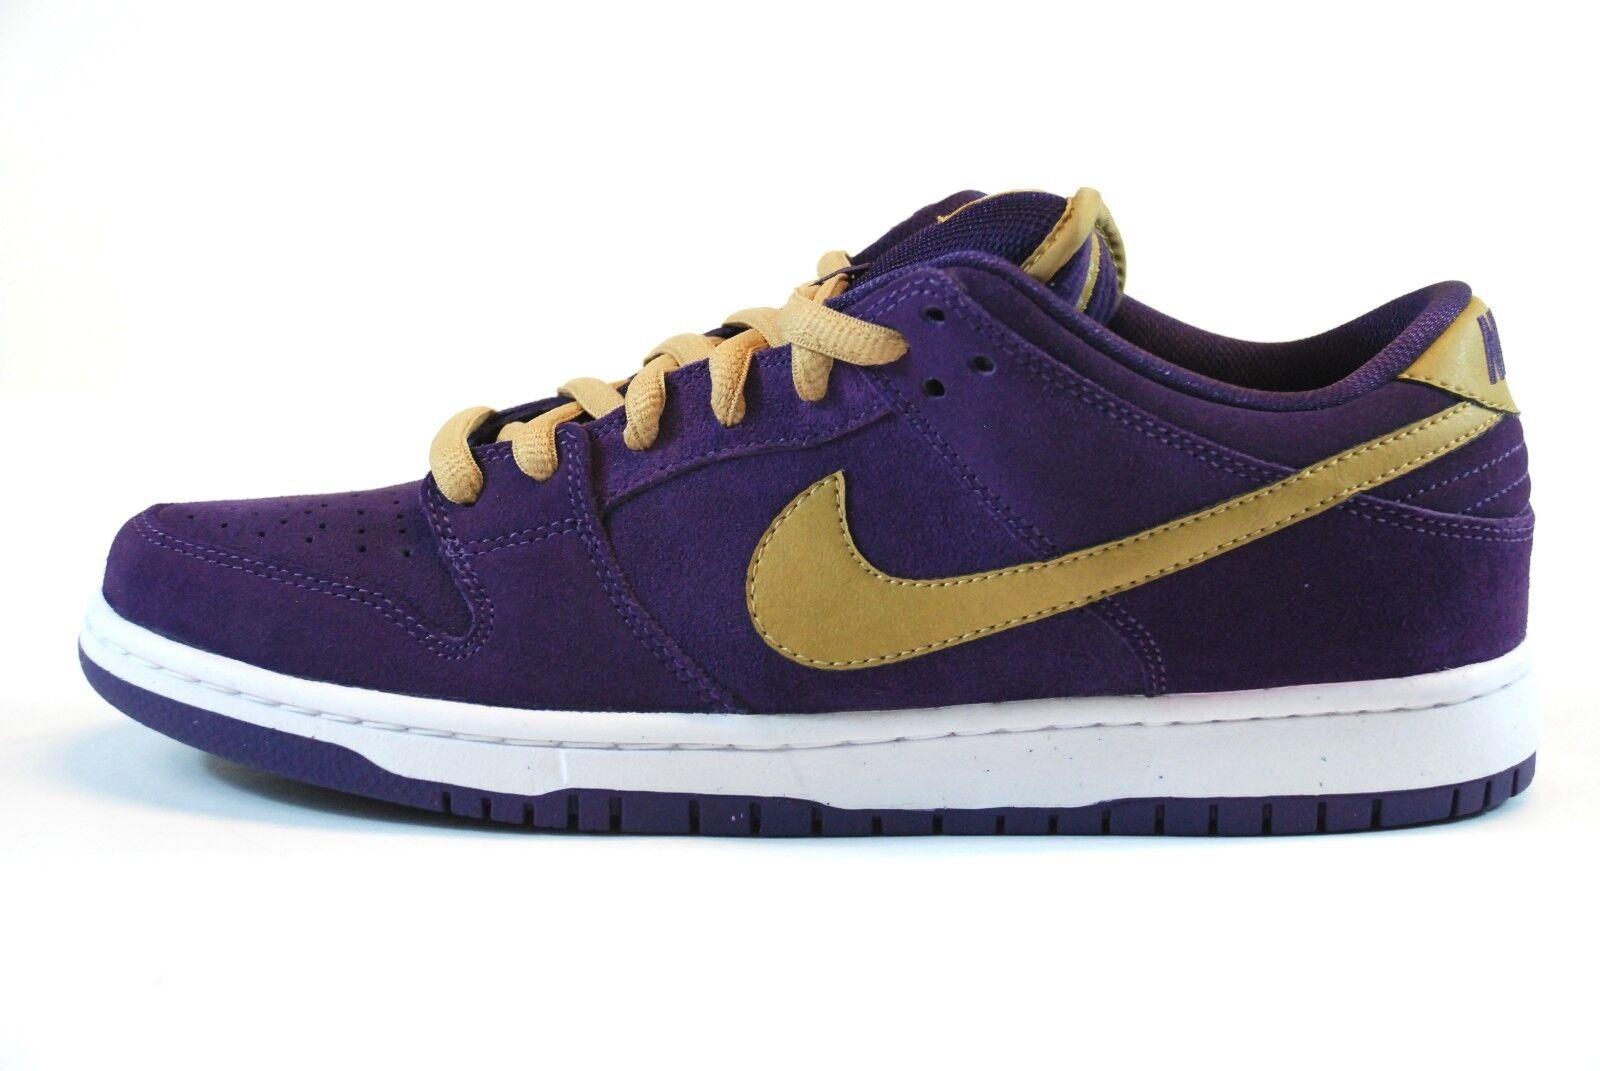 Nike dunk low premium sb quasar lila gold 313170-571 (164) (164) 313170-571 - schuhe 68baff